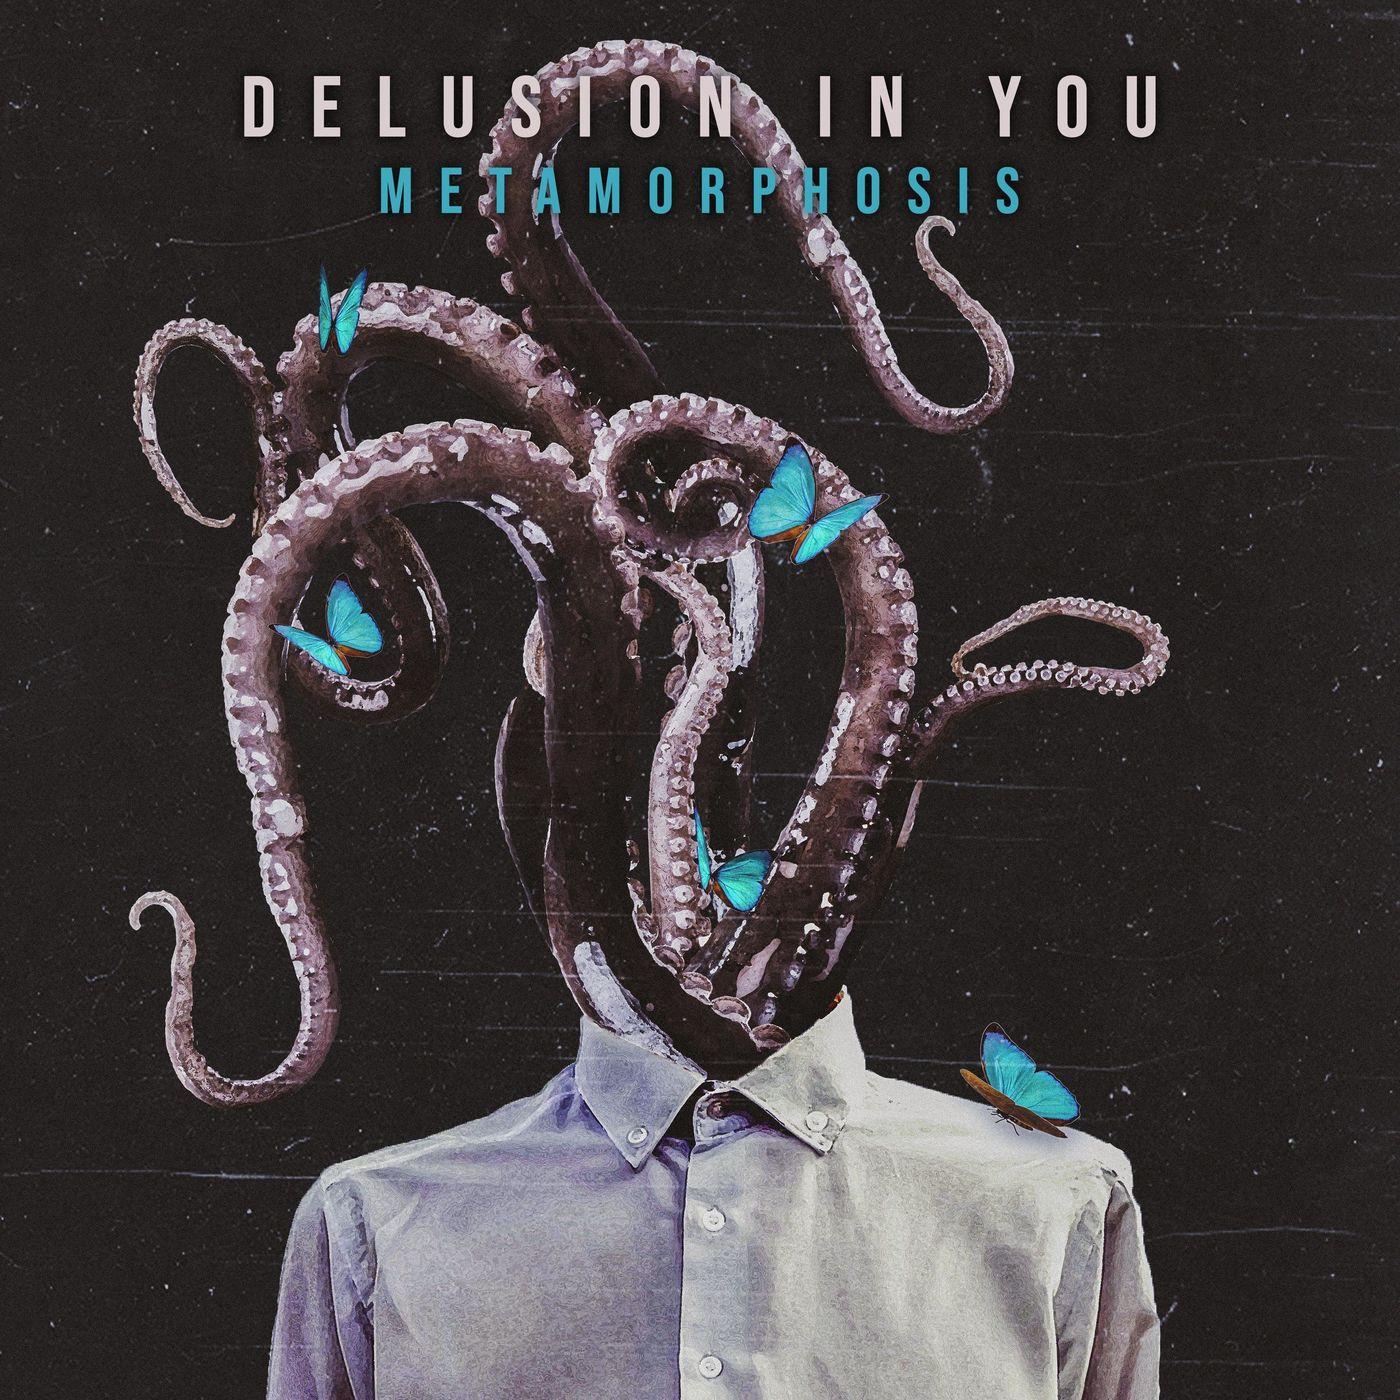 Delusion in You - Metamorphosis (2020)